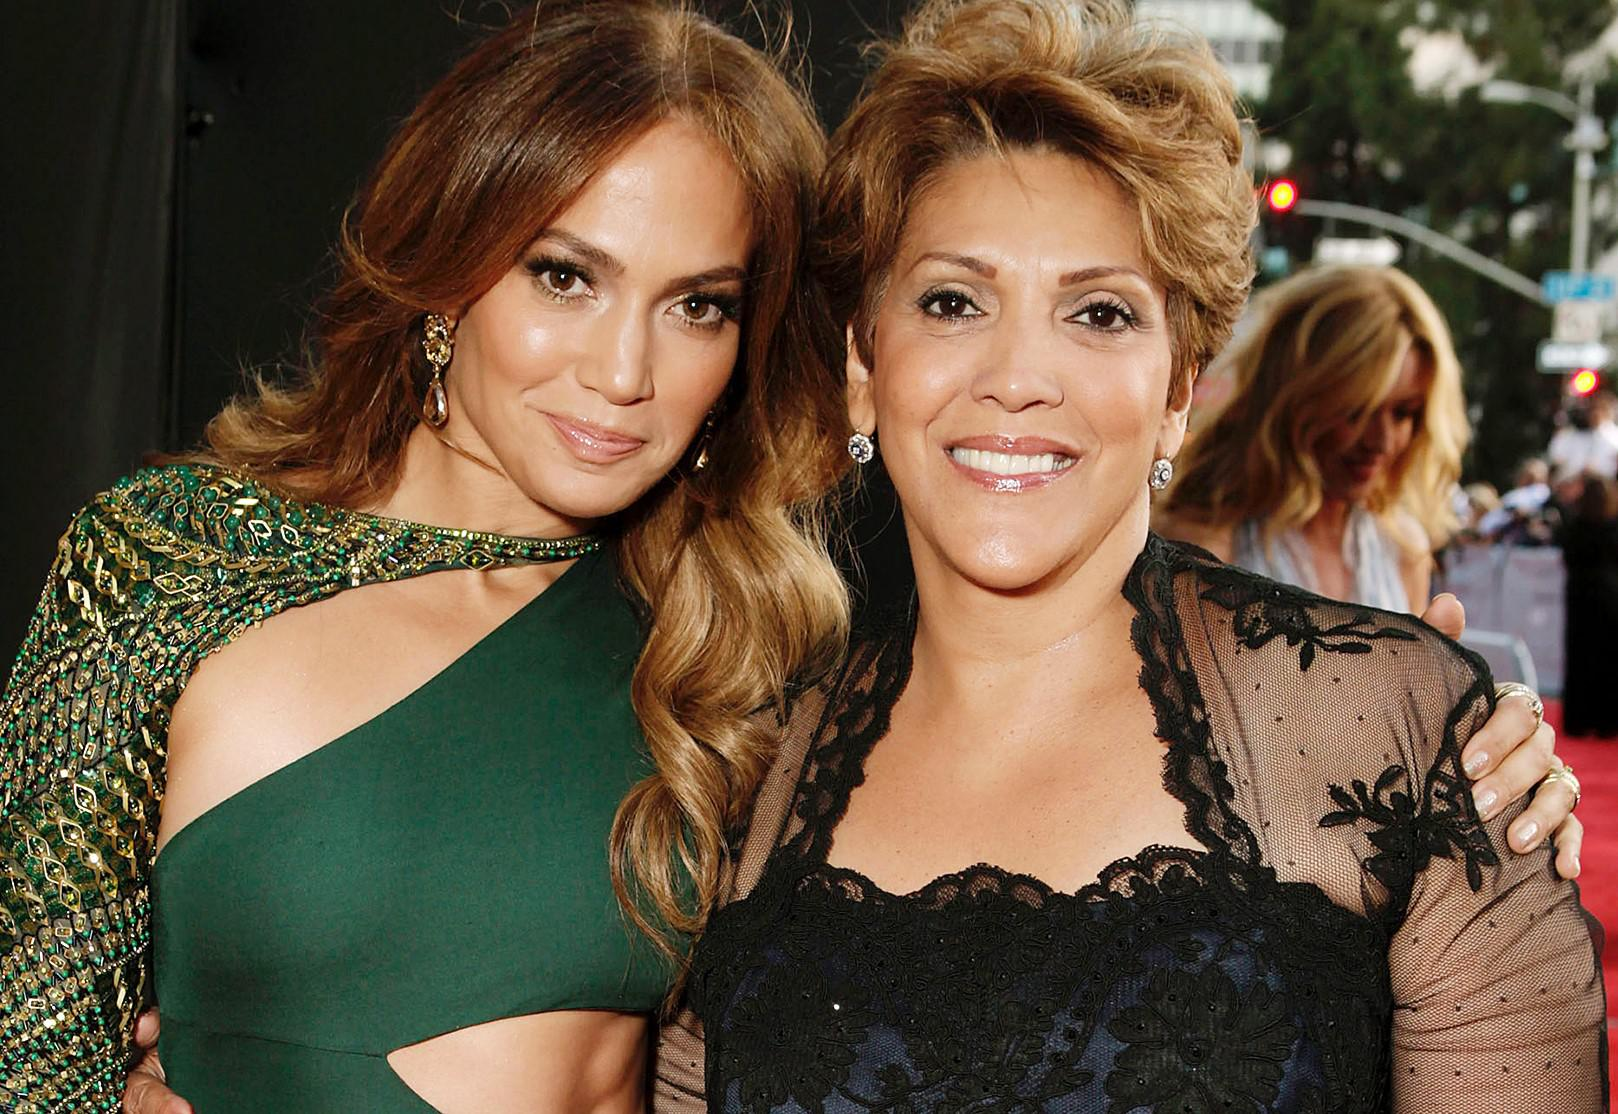 Ben Affleck managed to improve relations with mom Jennifer Lopez